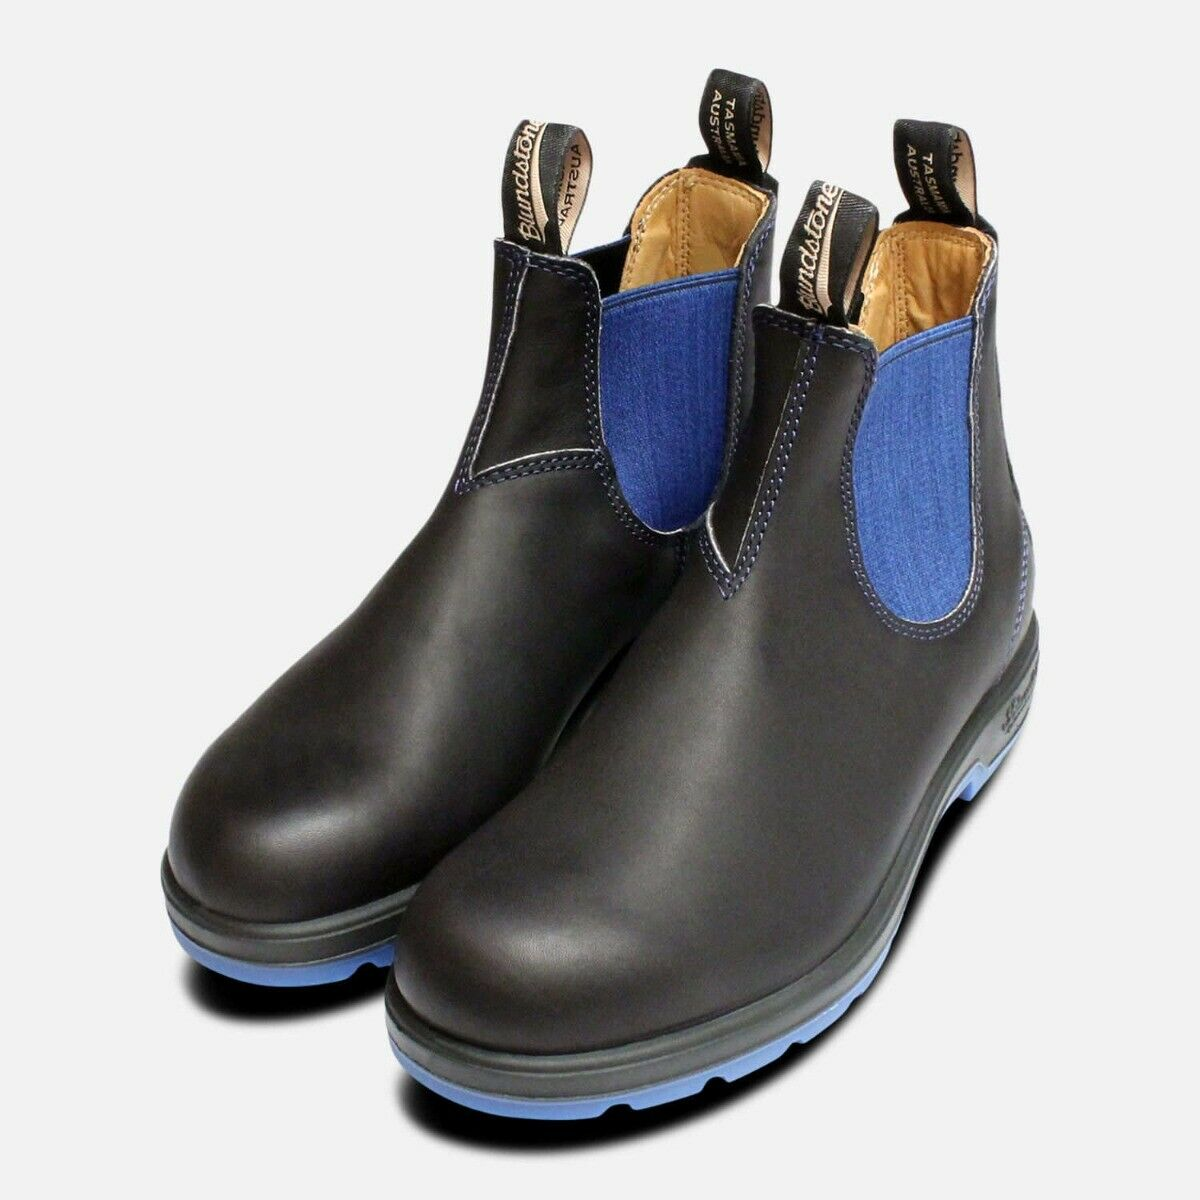 Ladies Blundstone 1403 1403 1403 nero & blu Chelsea 9d7bb1